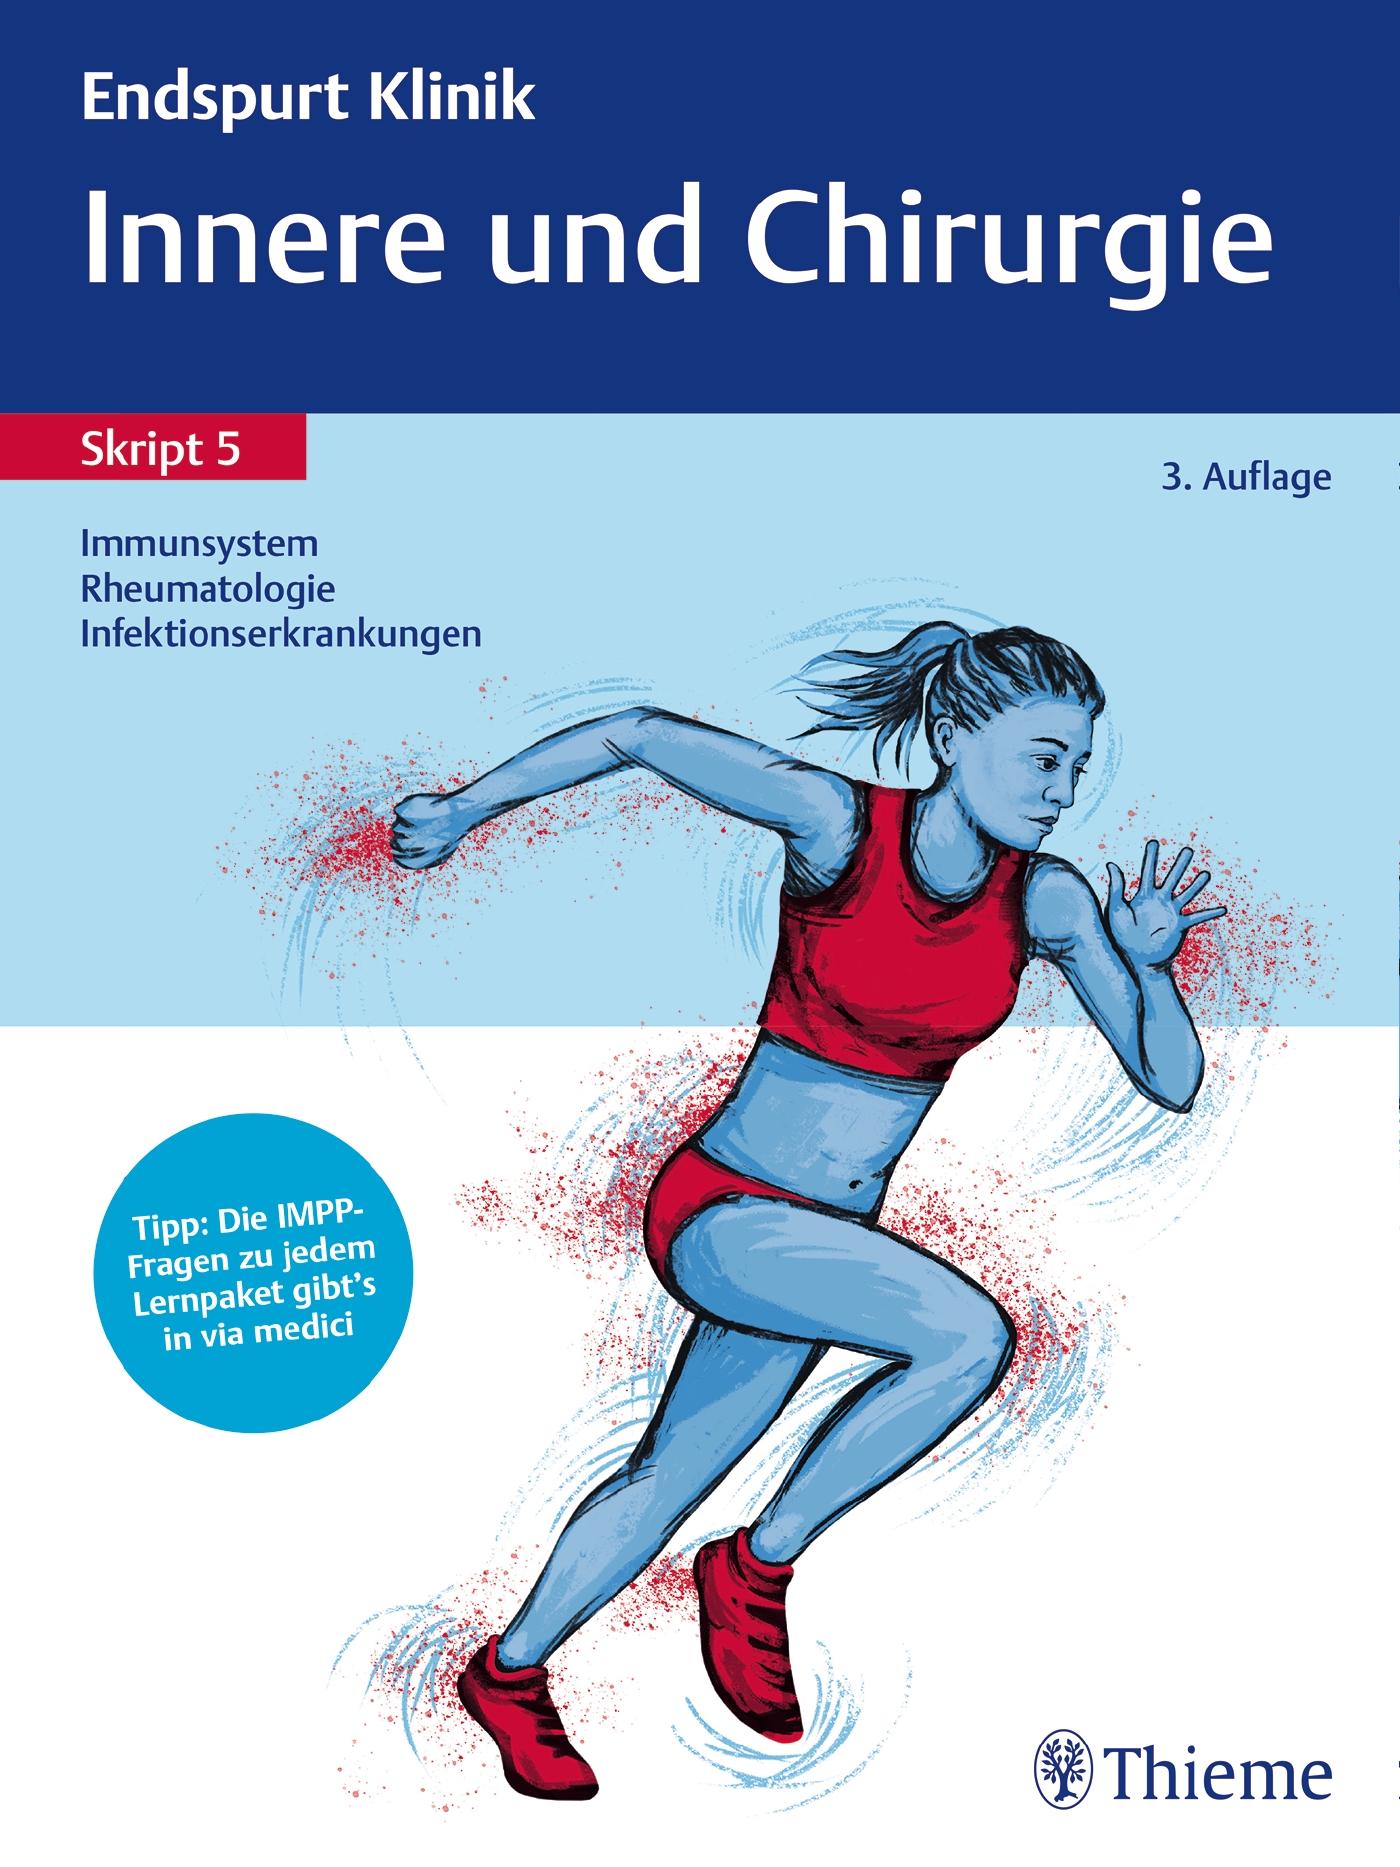 Endspurt Klinik Skript 5: Innere und Chirurgie - Immunsystem, Rheumatologie